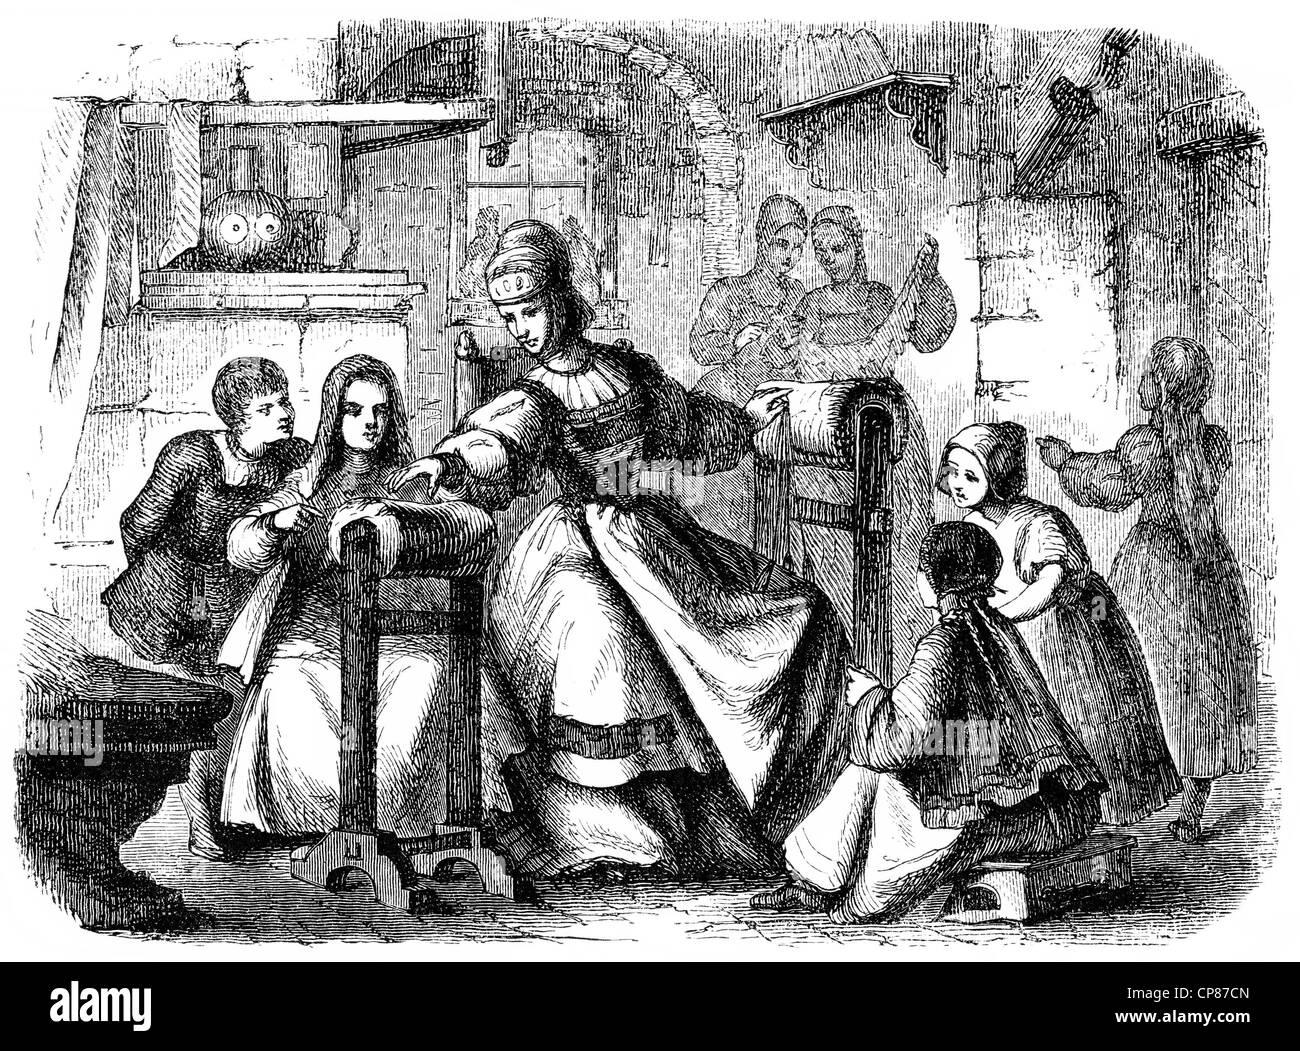 The publisher Barbara Uttmann or Uthman, 1514 - 1575, furthered the bobbin lacemaking in the Erzgebirge region, Stock Photo